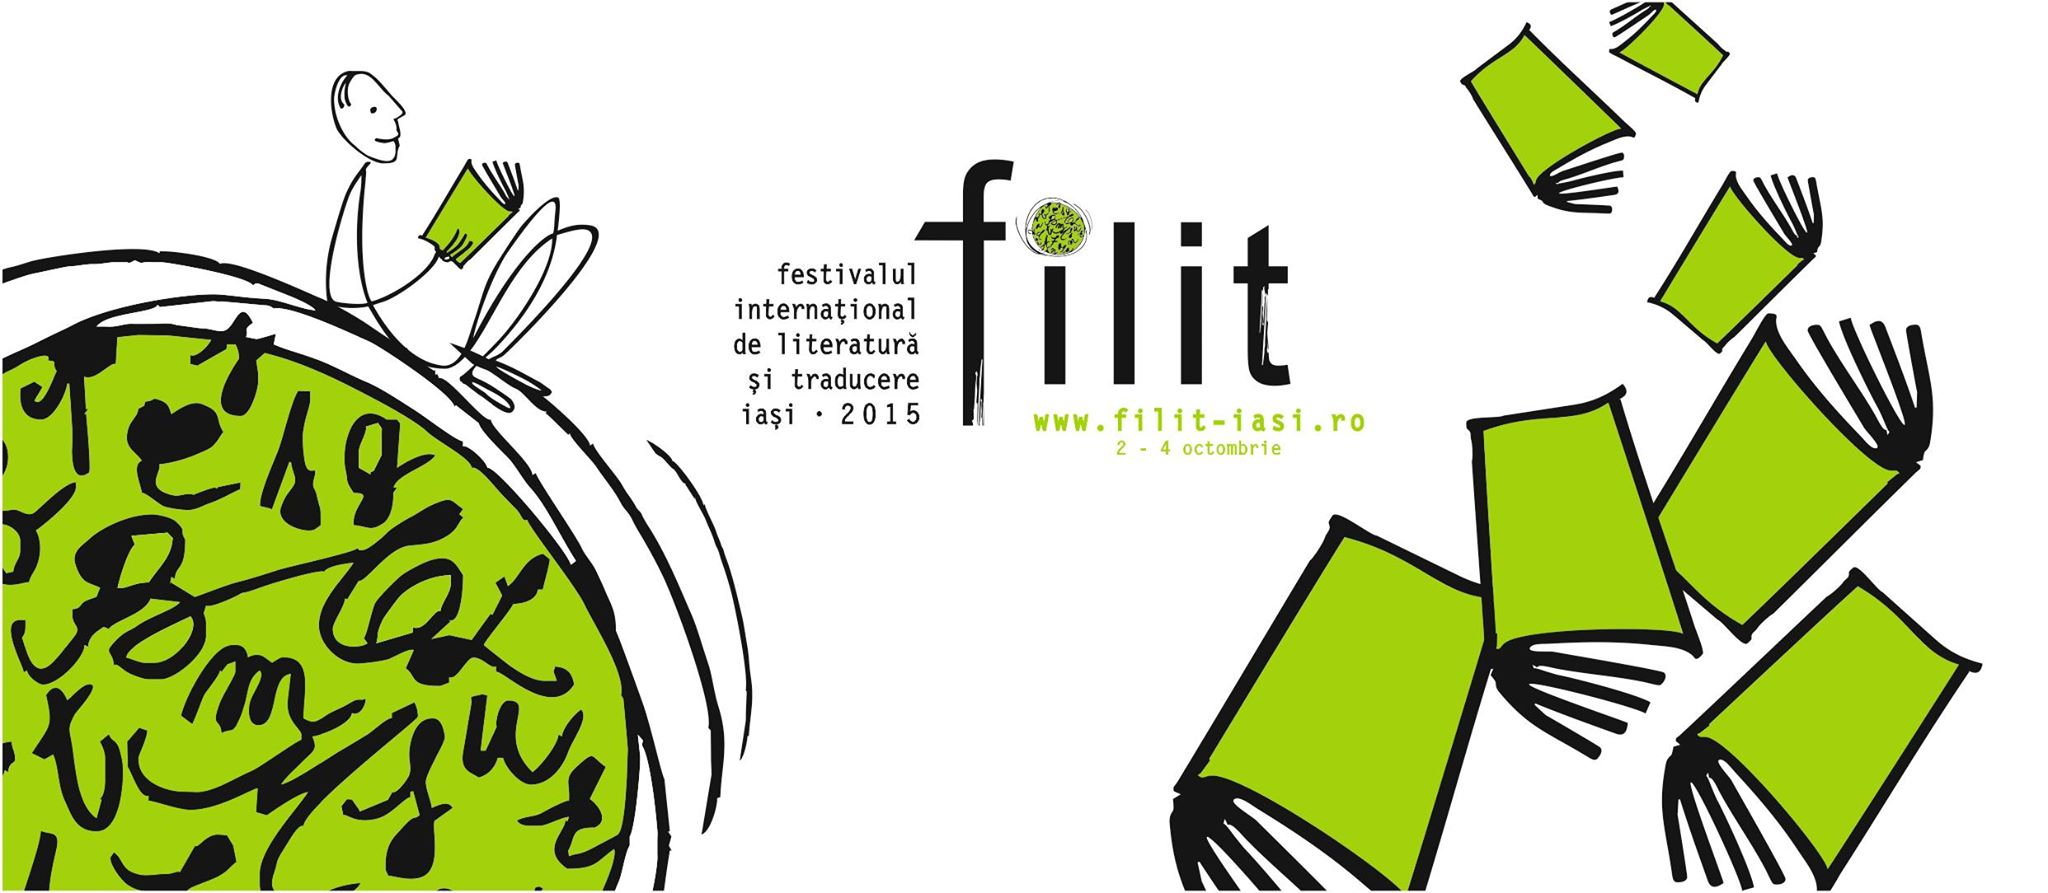 FILIT-iasi-2015-anunta-invitatii-foto-iasifun